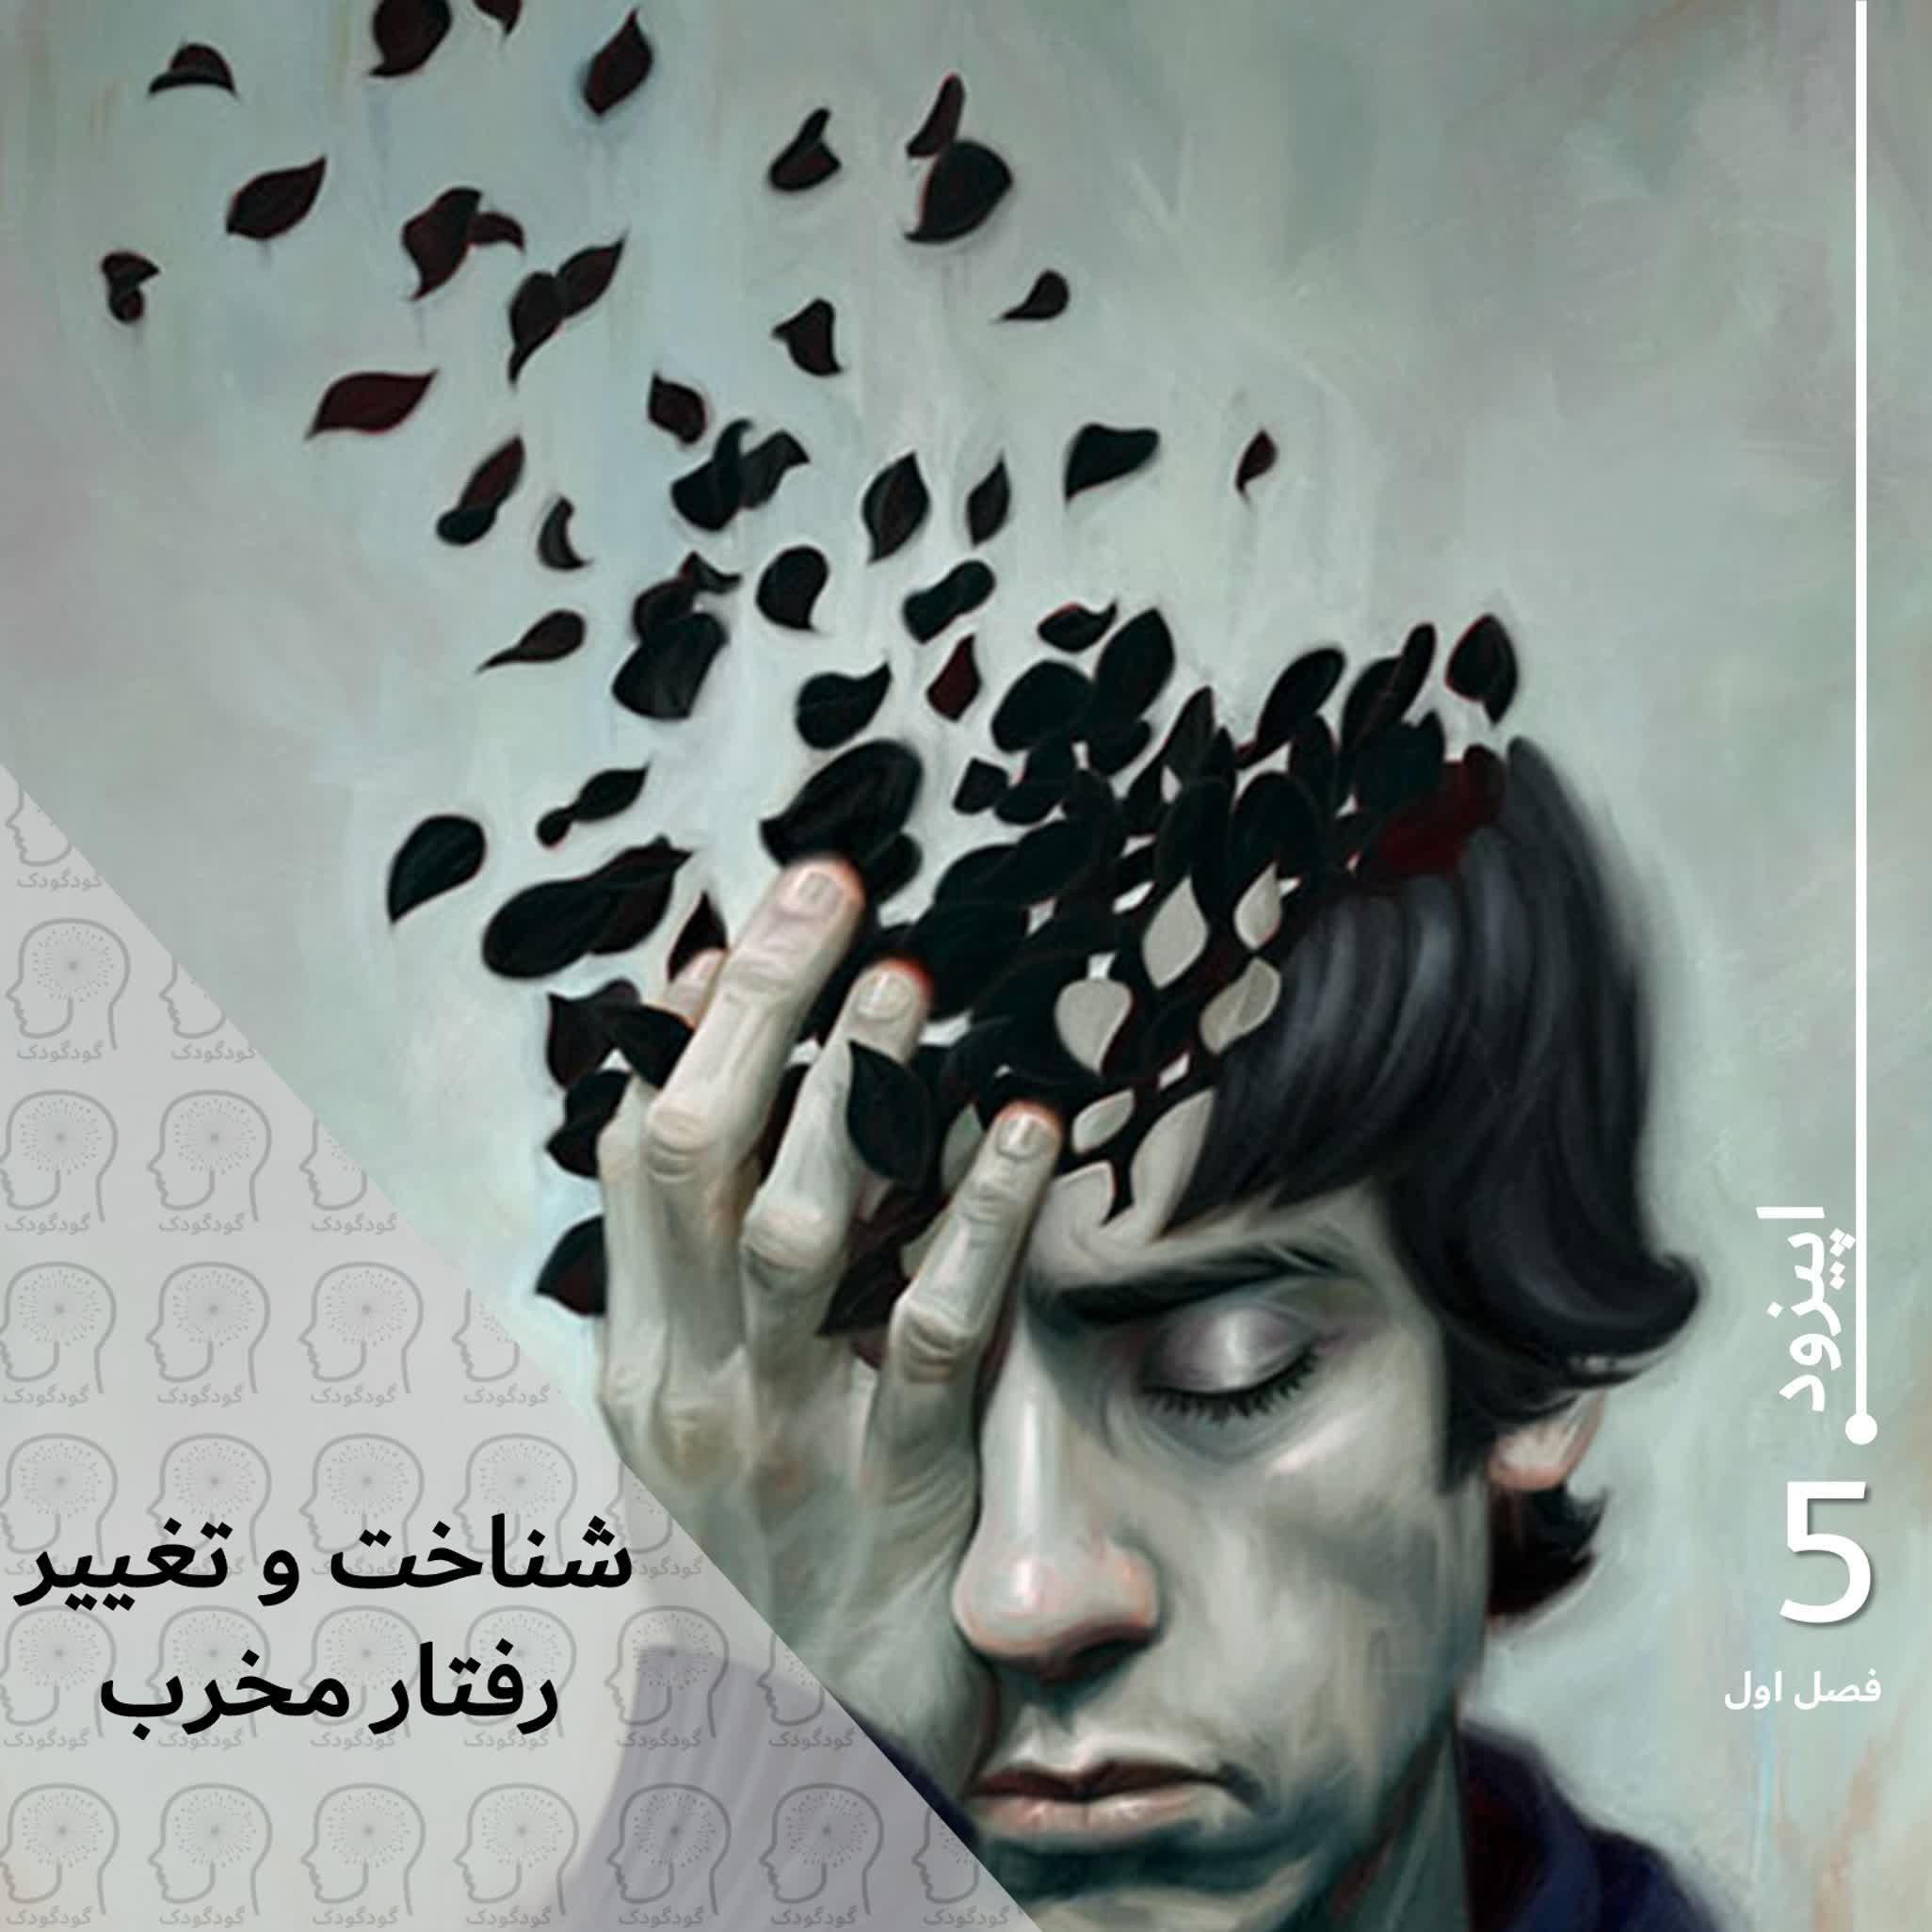 E05(1)  غلبه بر افسردگی و اضطراب: تغییر رفتار